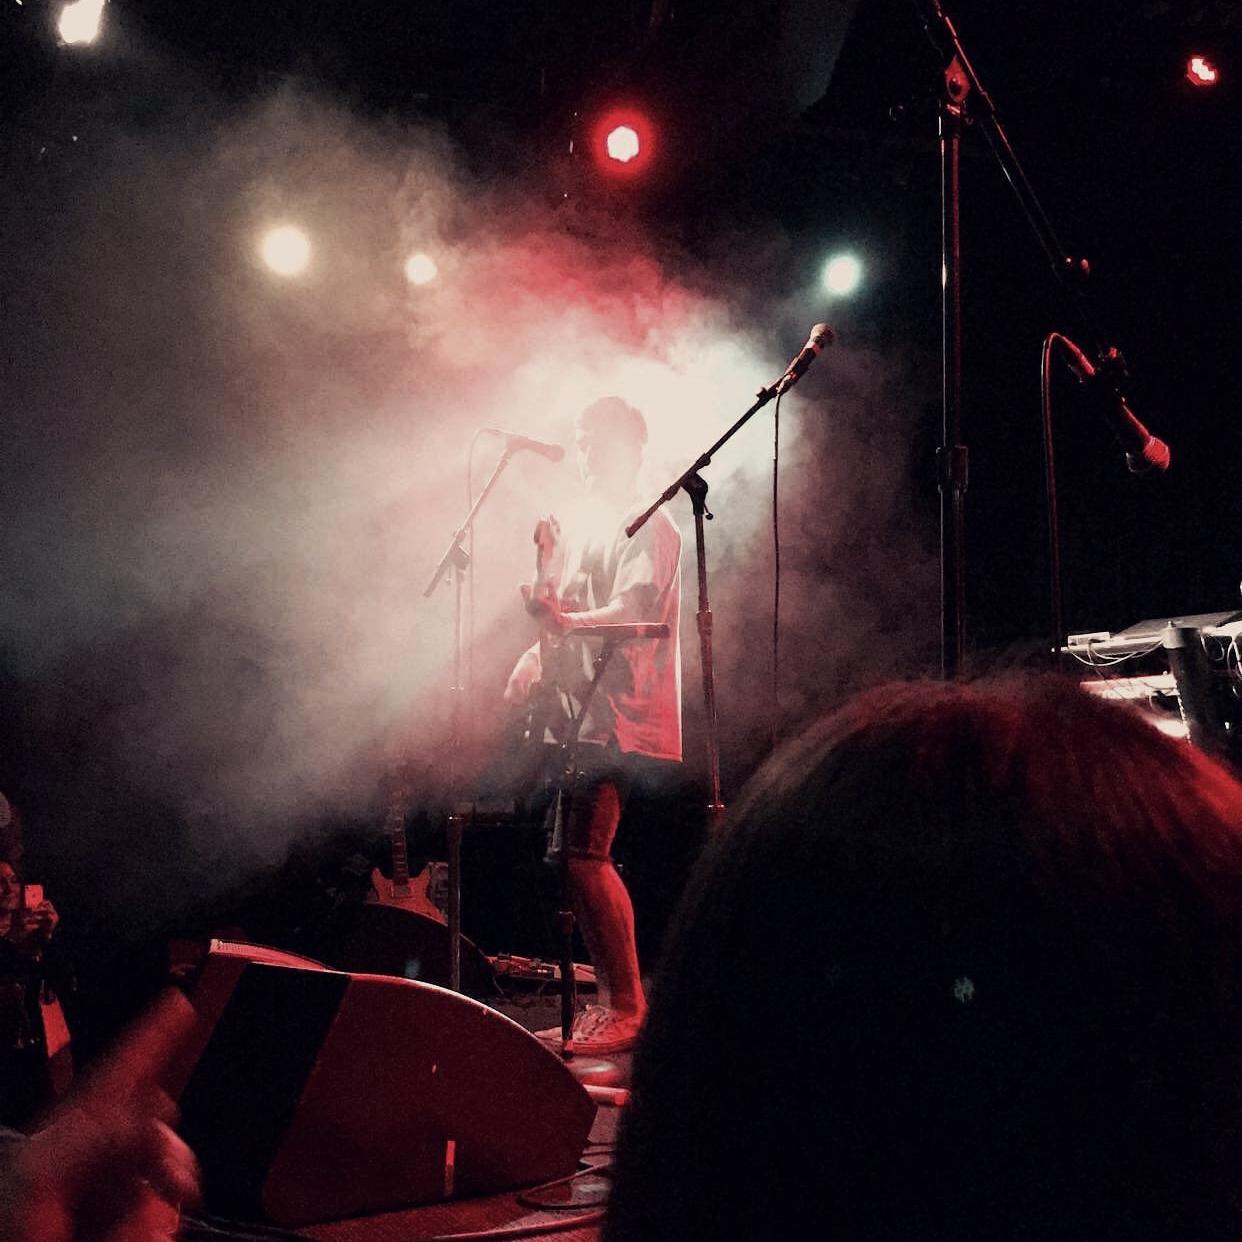 Waiks performing live at The Crocodile